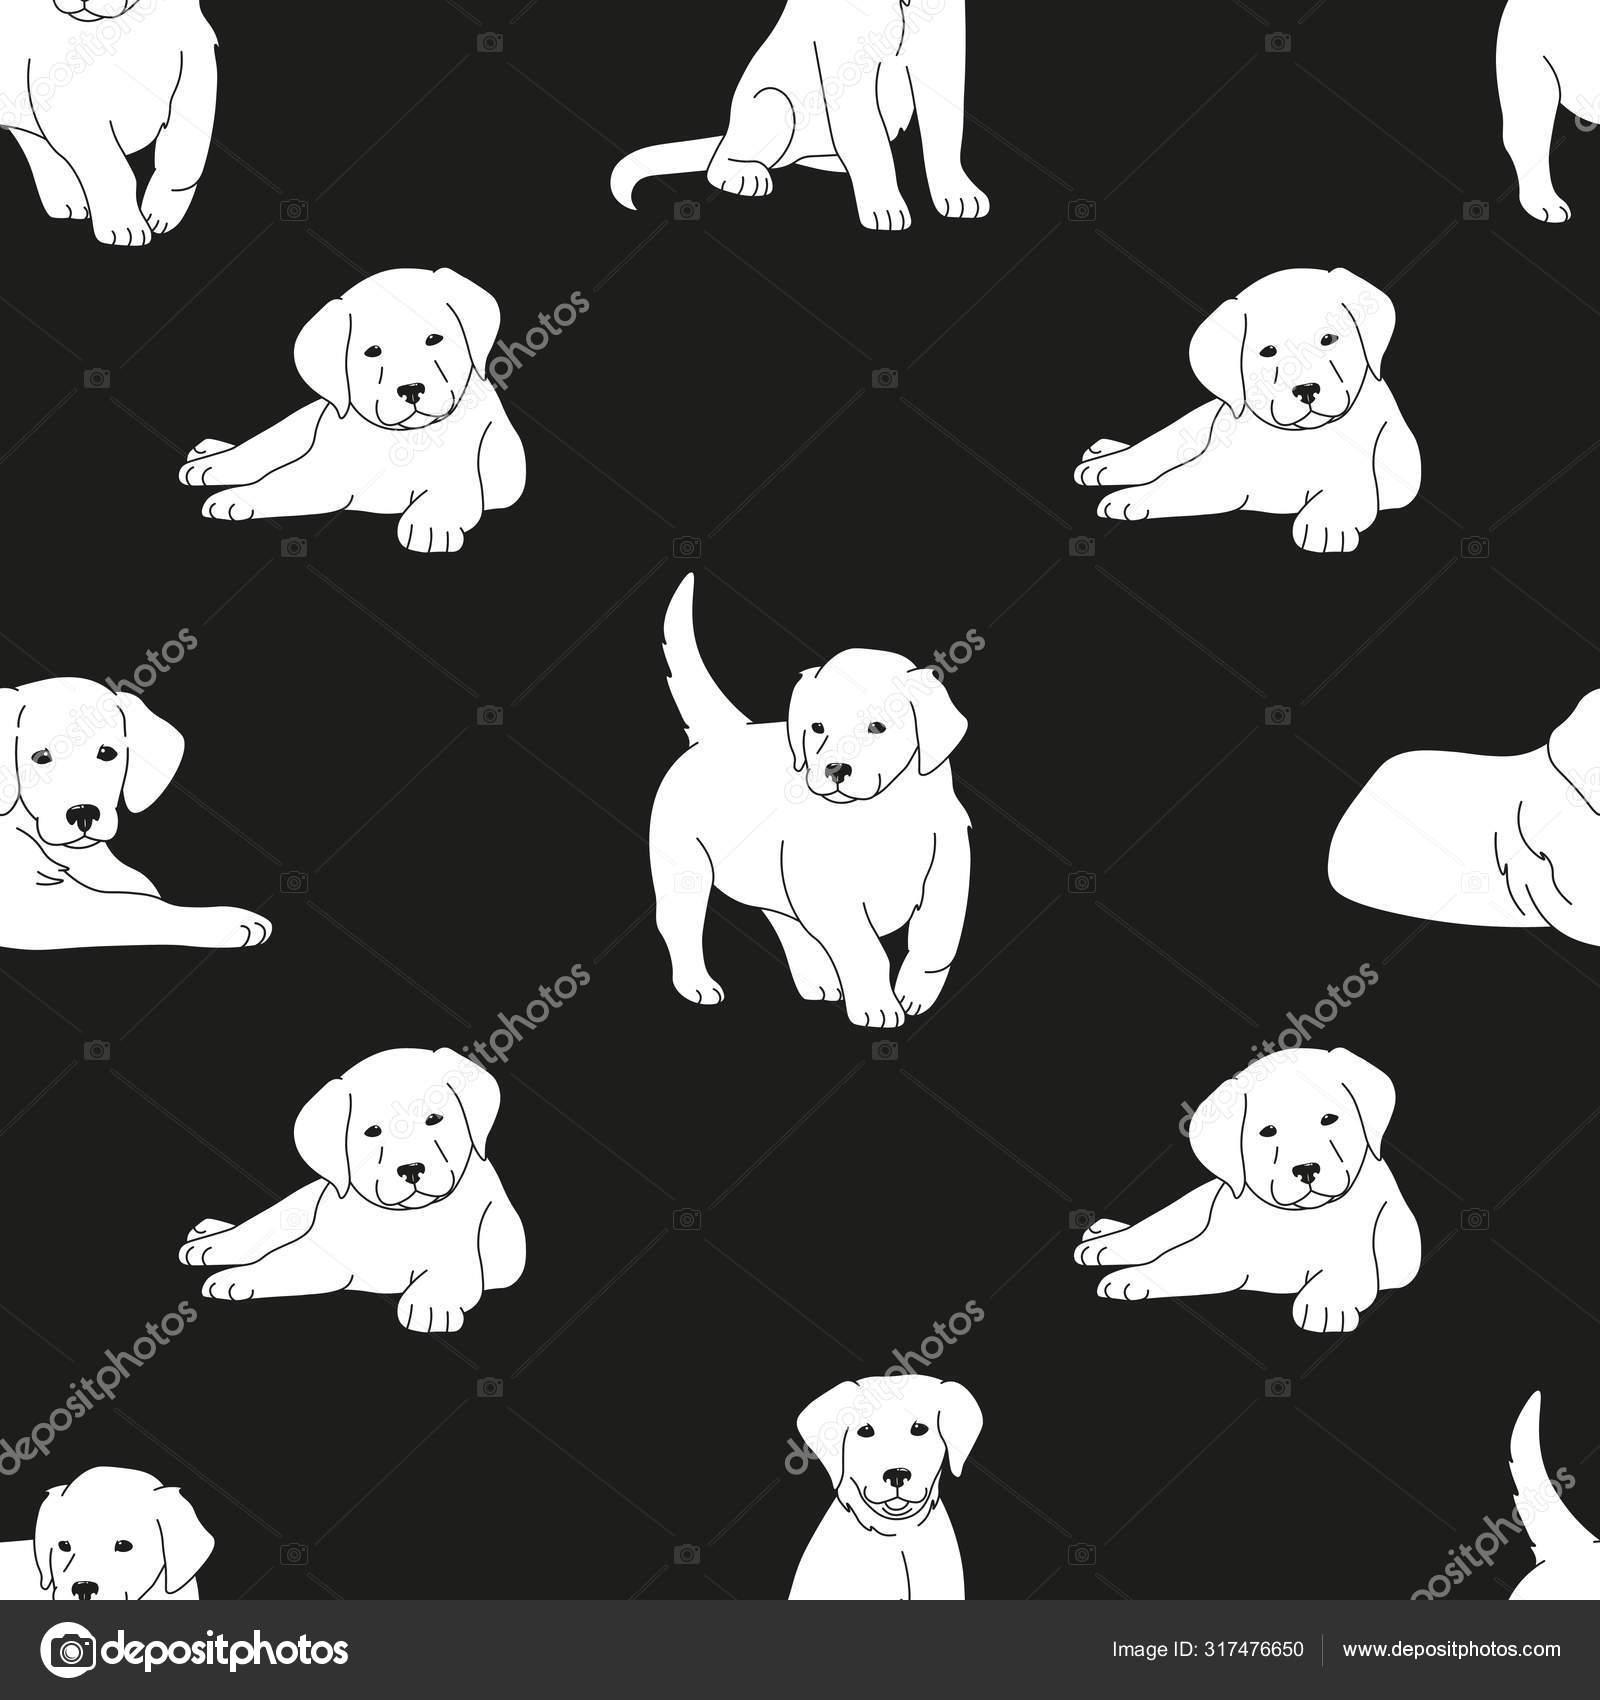 Cute White Puppies Black Thin Lines Silhouettes Black Background Seamless Stock Vector C Yanicorn 317476650